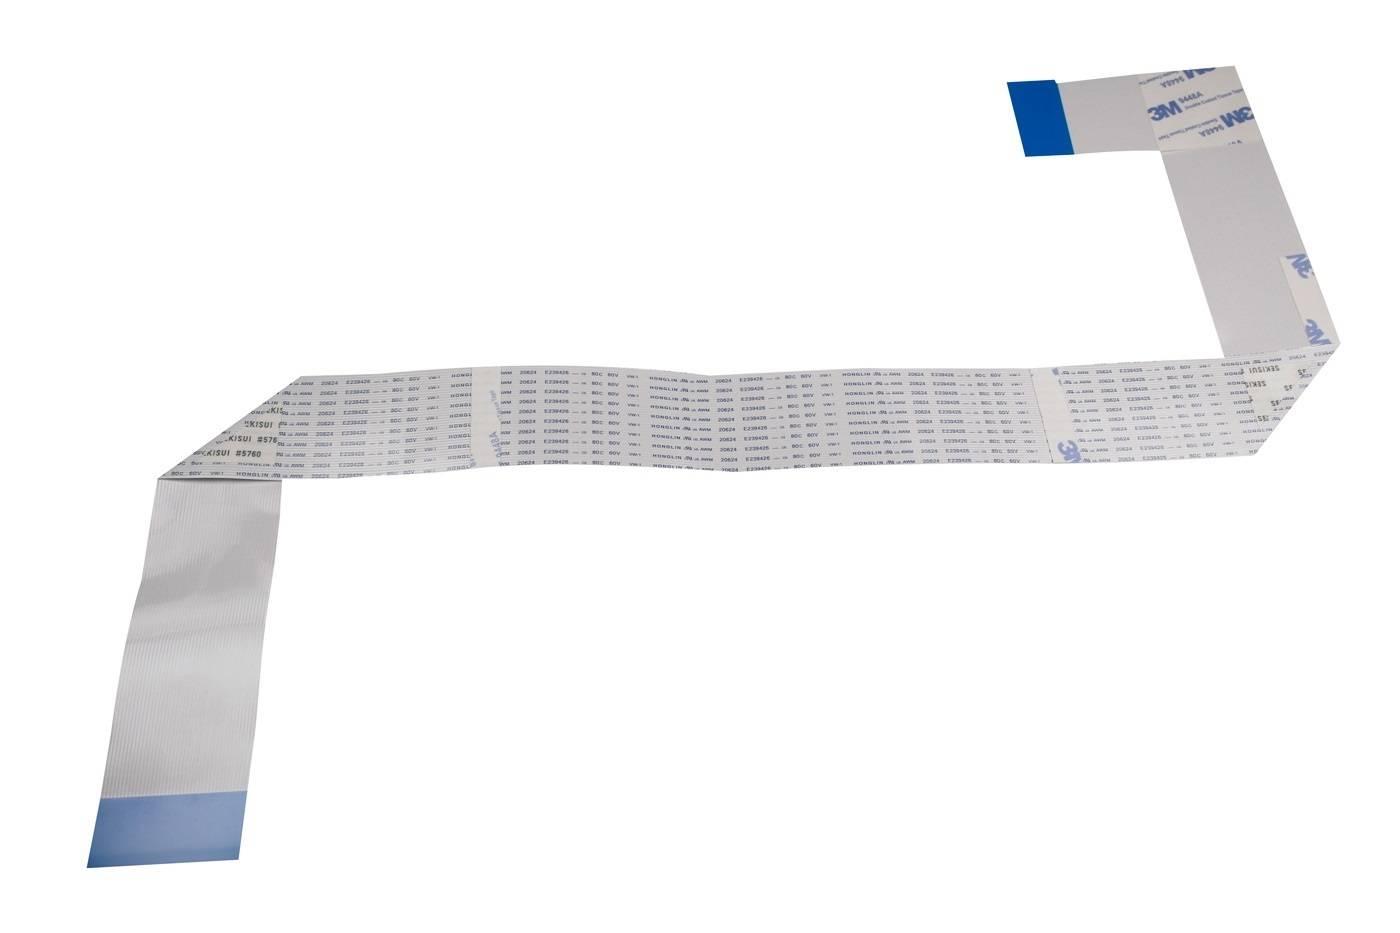 Фото Шлейф узла сканирования Samsung SCX-8123, 8128, CLX-9201, 9251, 9301 (JC39-01673A) (o)